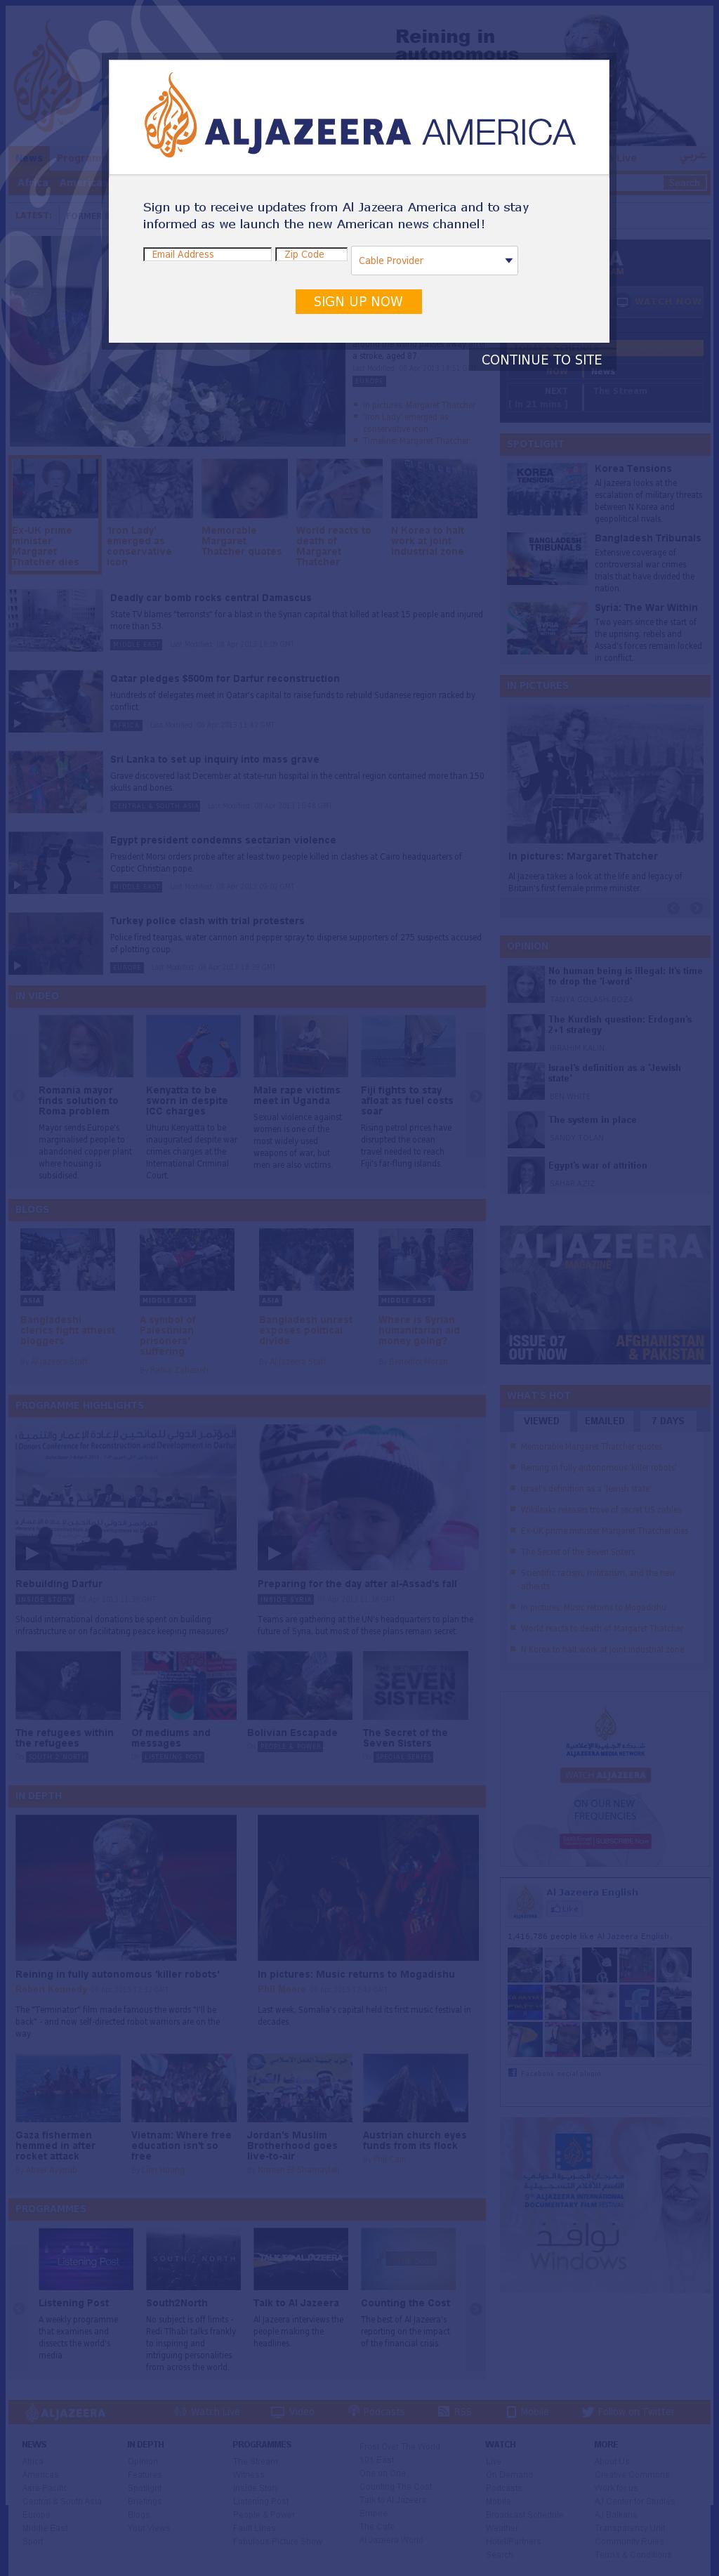 Al Jazeera (English) at Monday April 8, 2013, 7:10 p.m. UTC